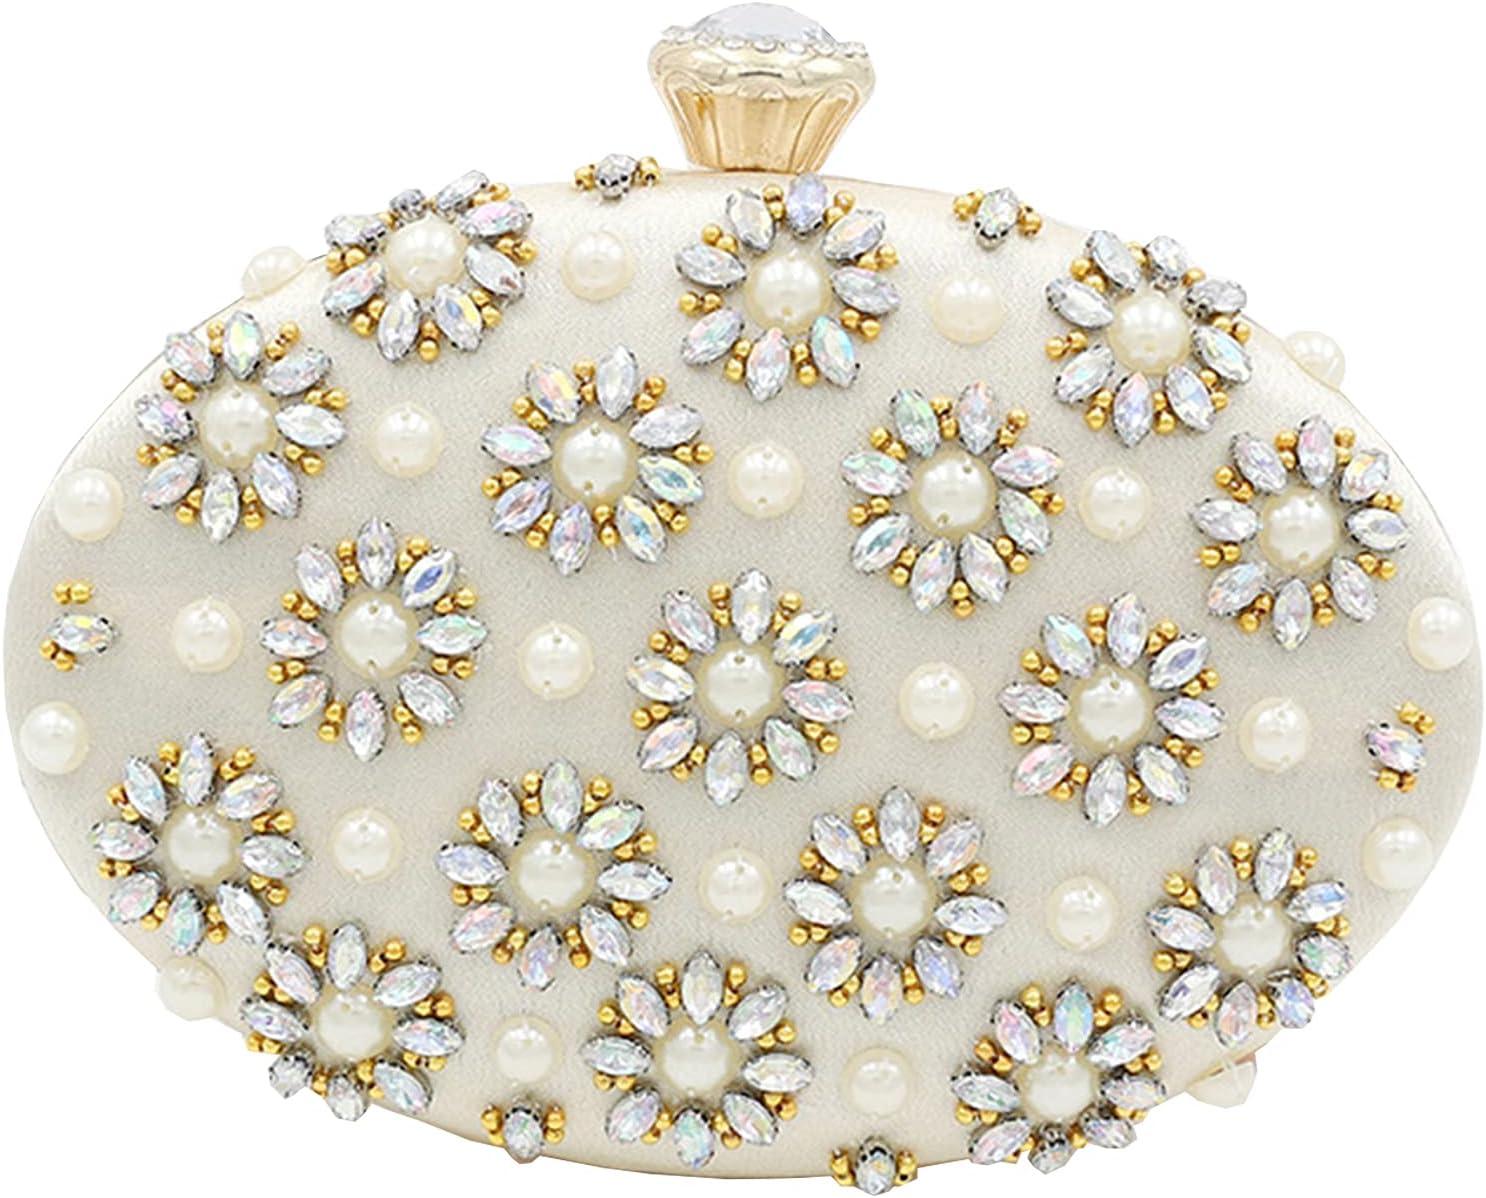 YANGB Beige Diamond Bargain Max 52% OFF Round Clutch Pearl Purse Bag Small Bod Cross